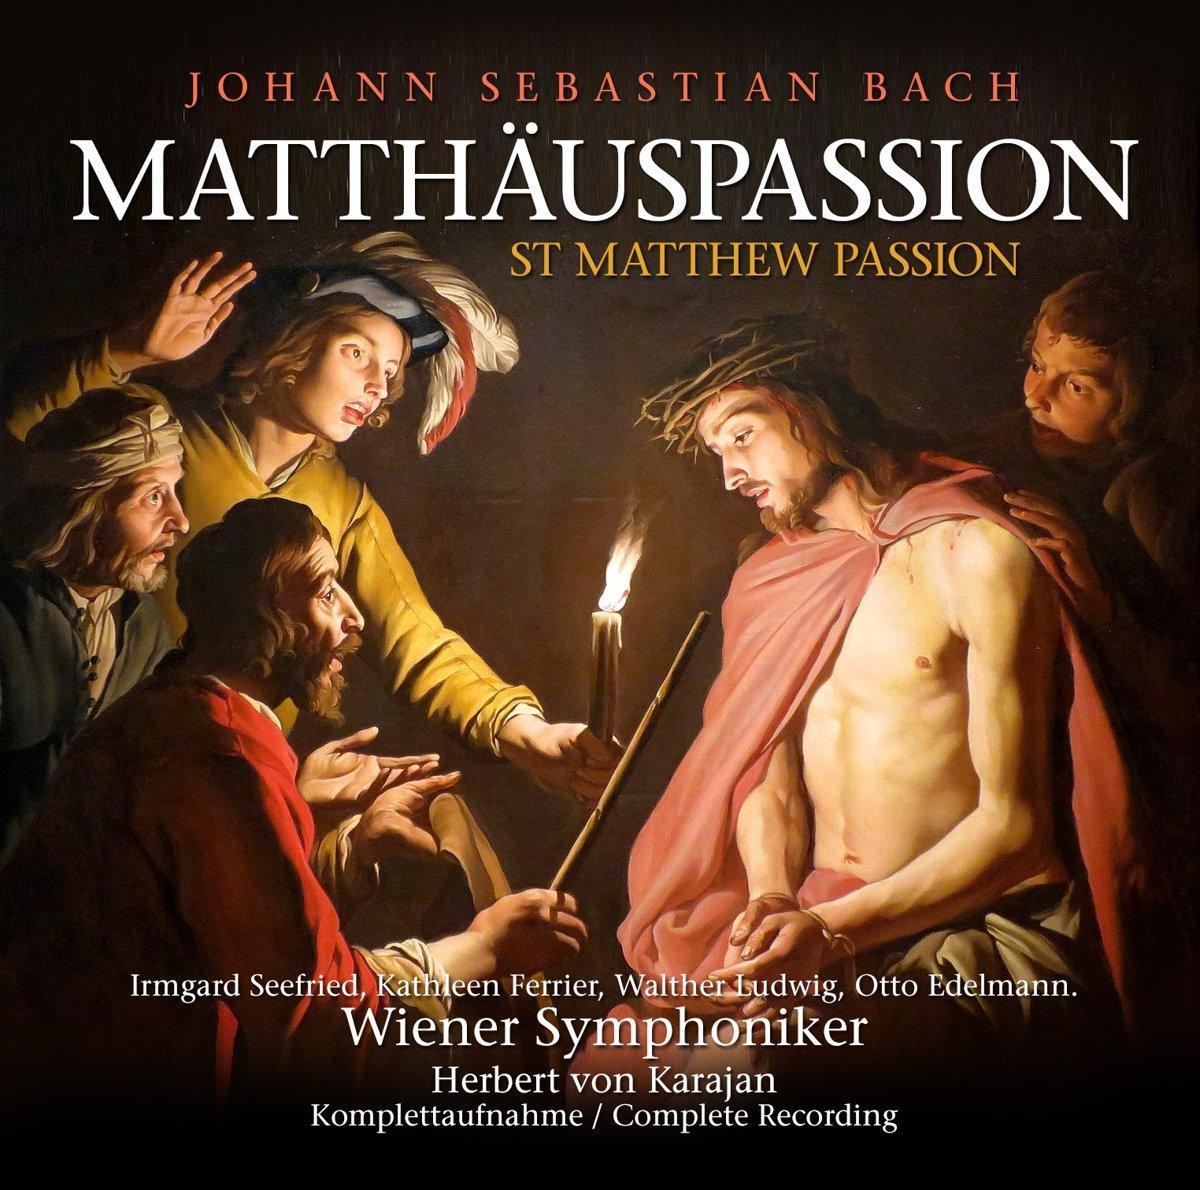 лучшая цена Иоганн Себастьян Бах,Герберт Караян Johann Sebastian Bach, Herbert Von Karajan. Die Matthauspassion (3 CD)